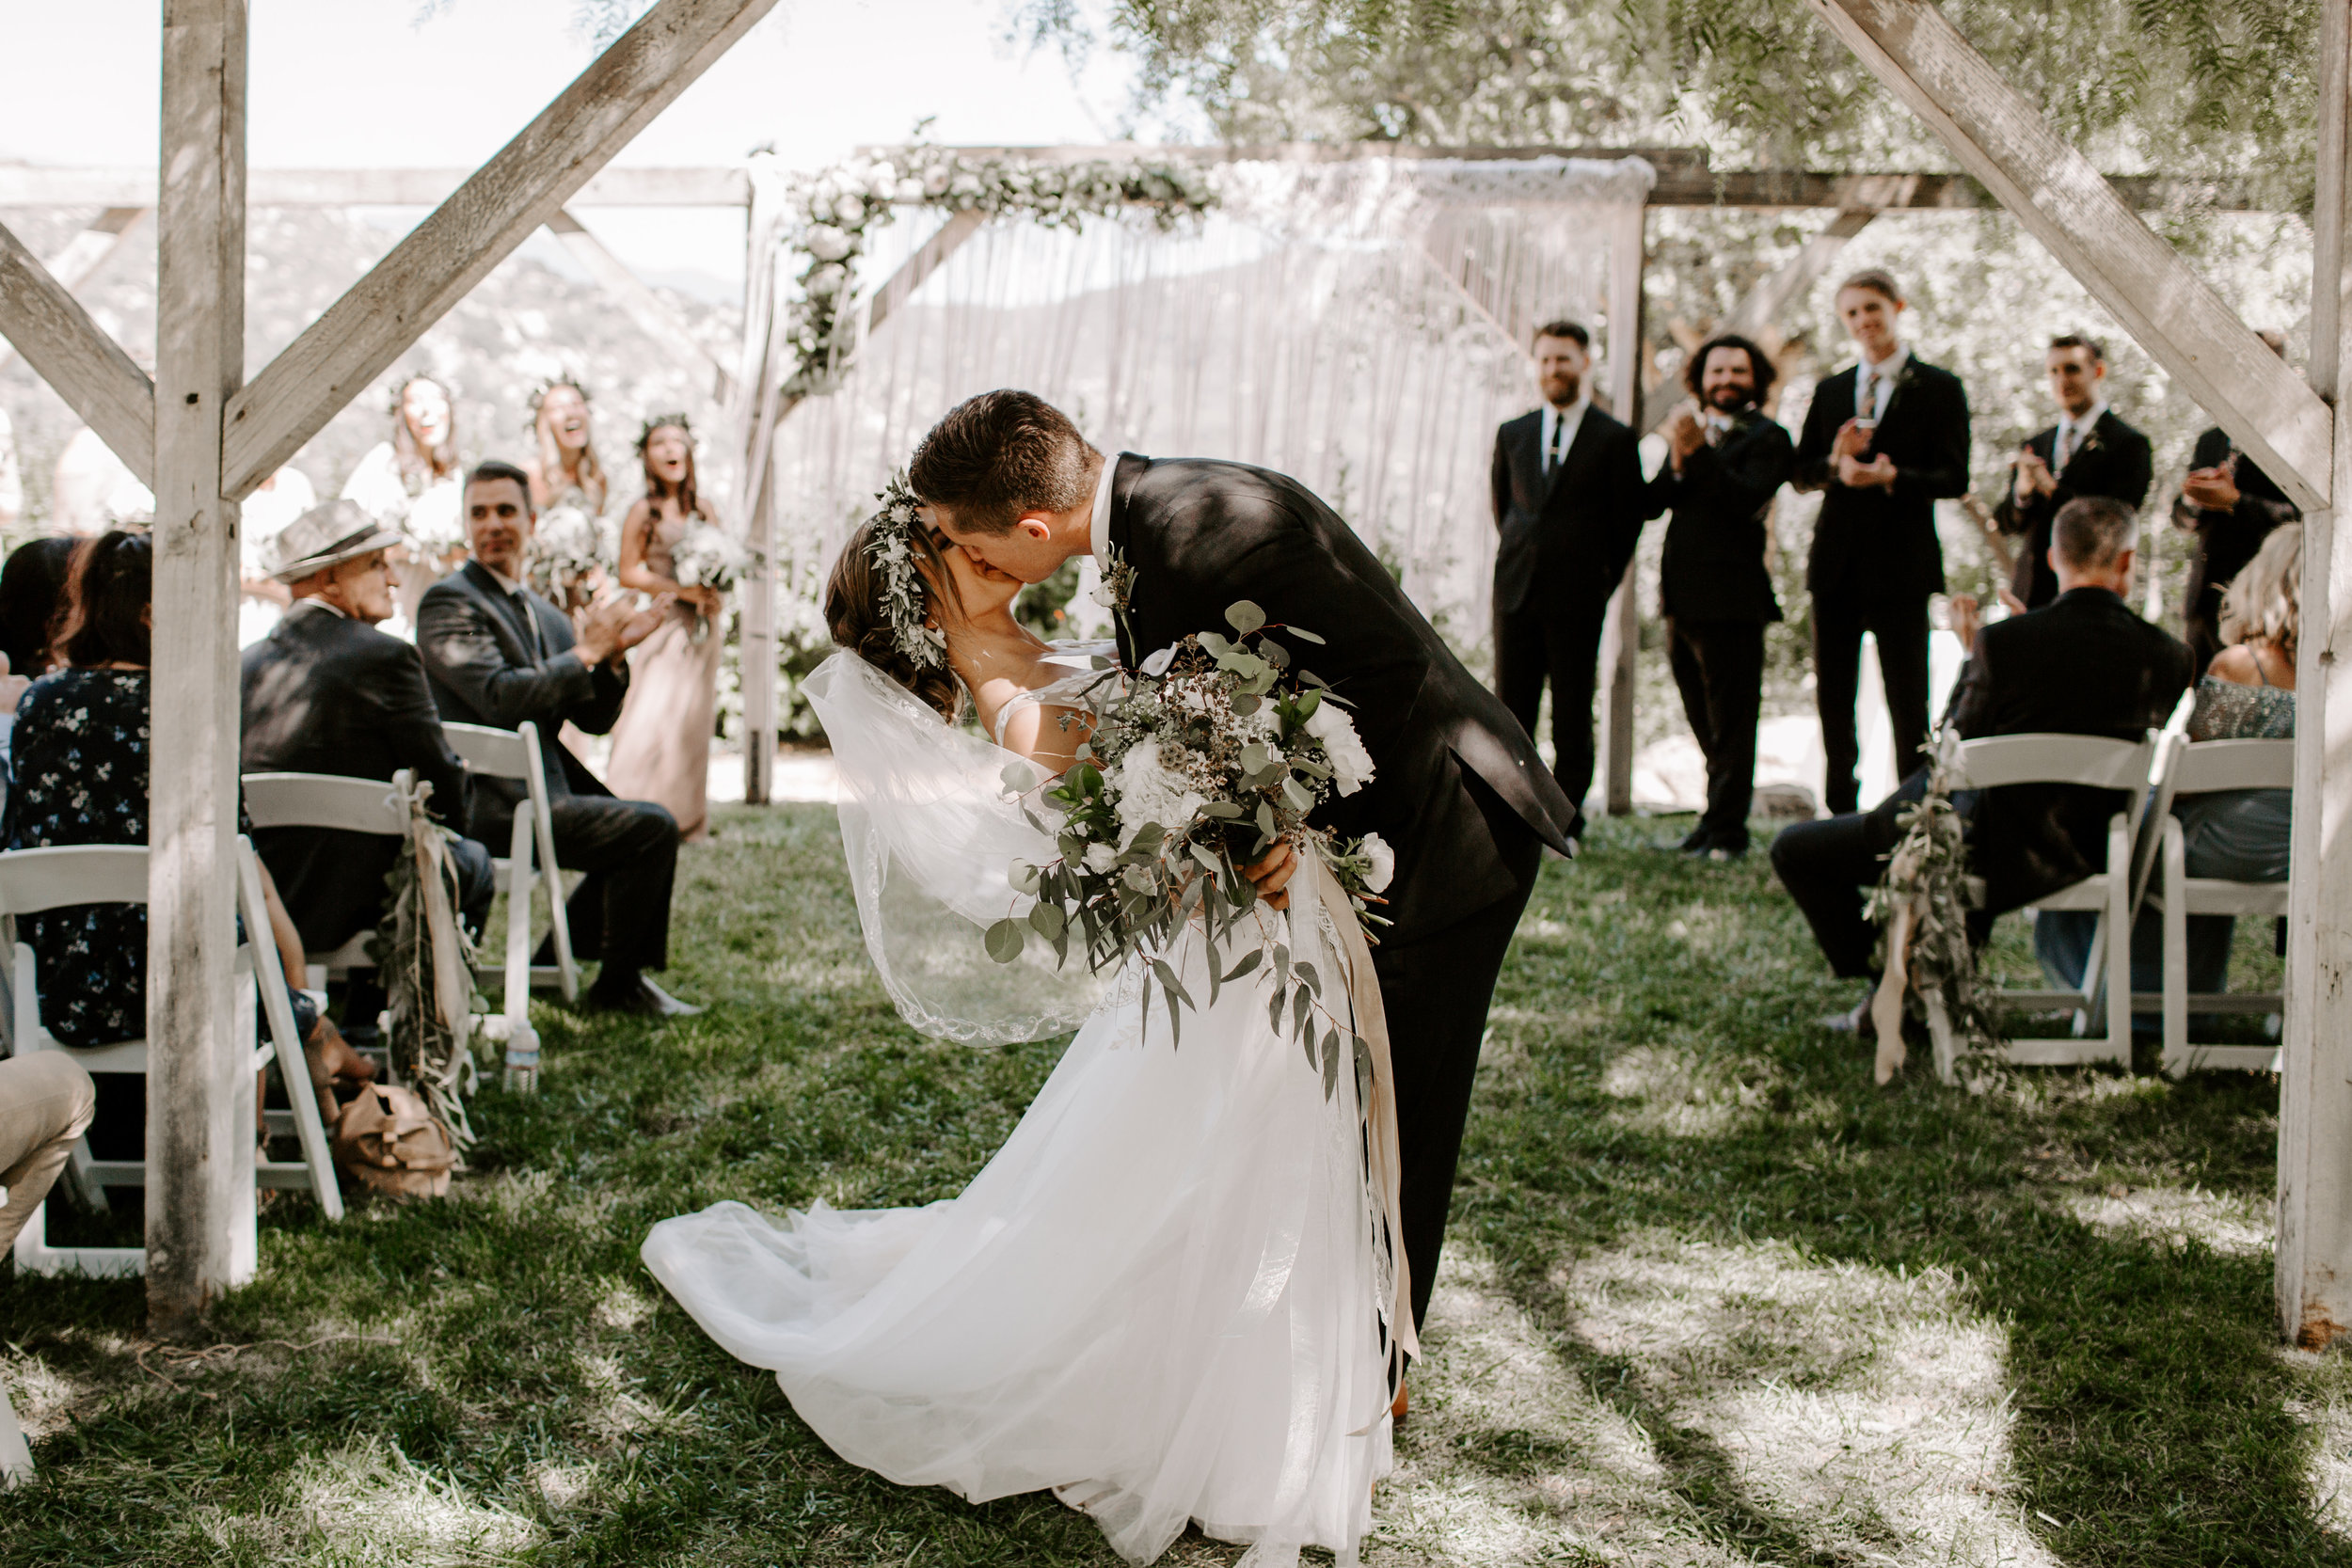 kate+zack_wedding_secludedgardenestate_temecula_madisonrylee_0399.jpg